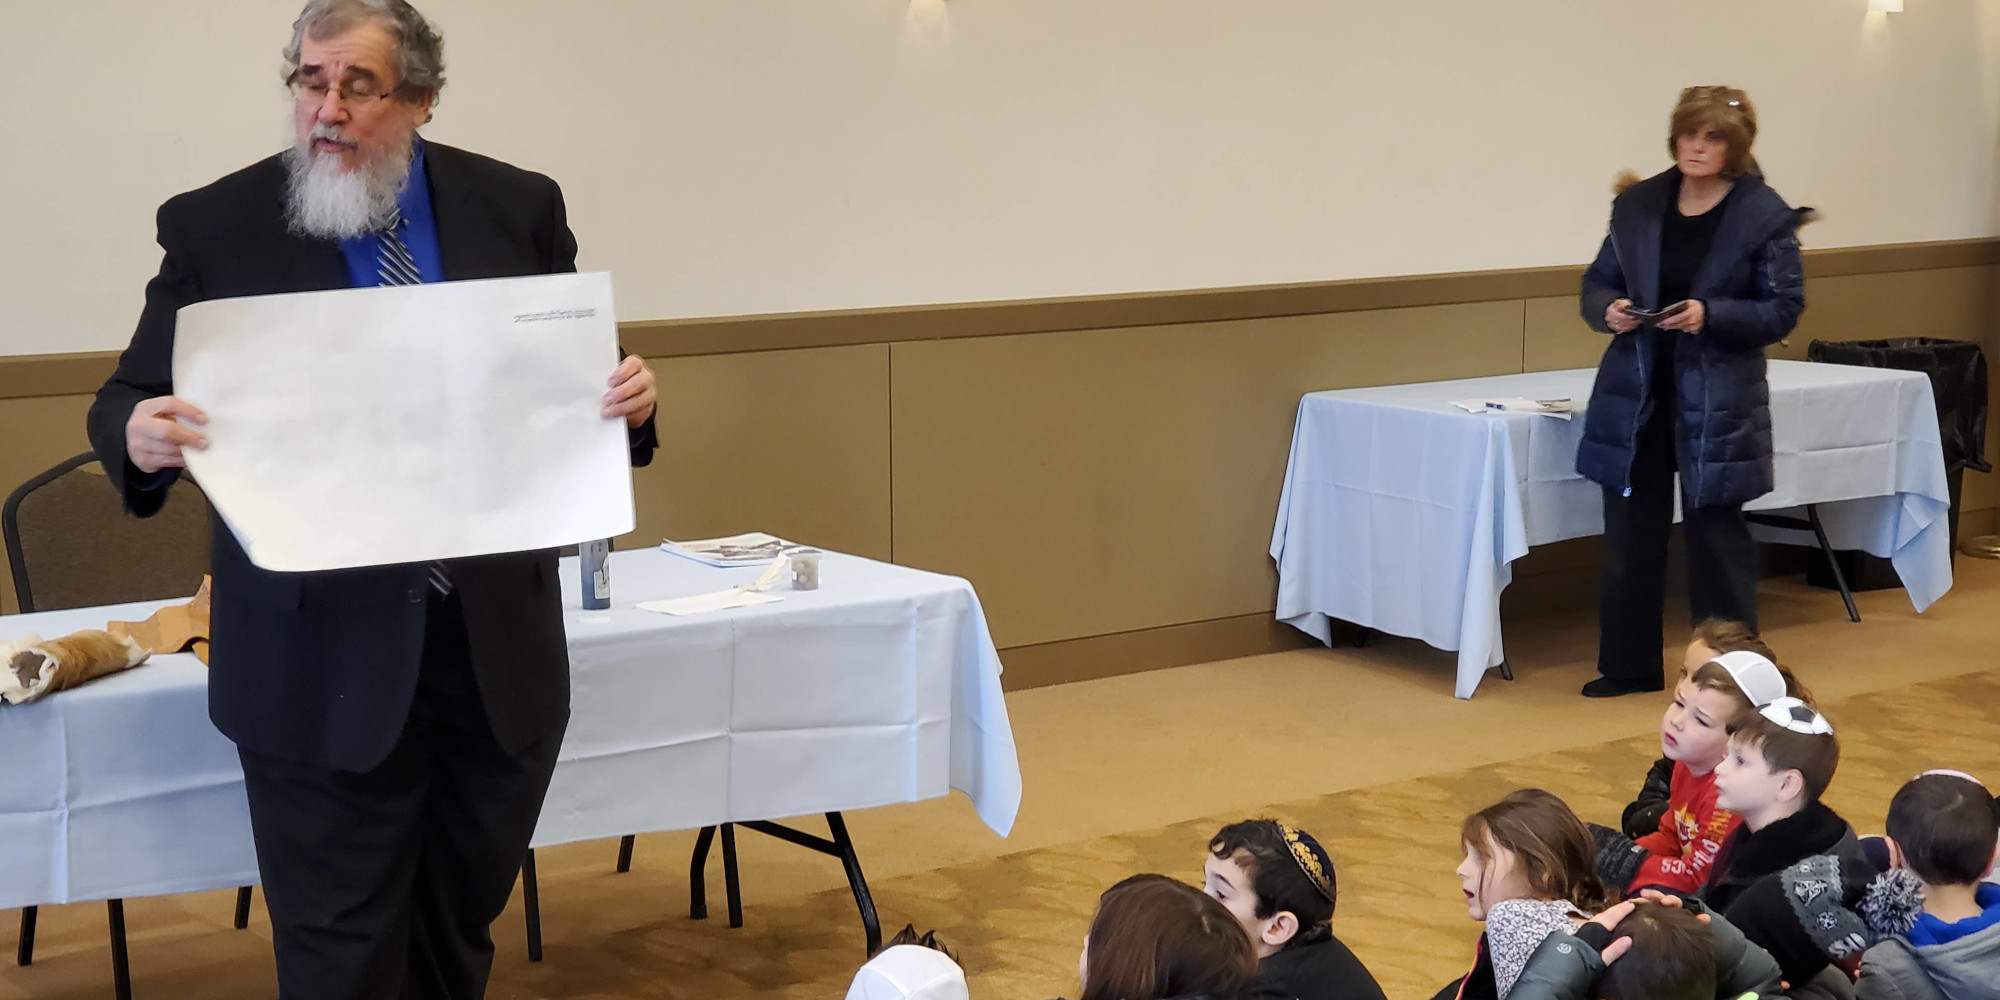 "<span class=""slider_title"">                                     The Year of the Torah--2020 / 5781                                </span>                                                                                                                                                                                       <span class=""slider_description"">Zerach, our scribe, explains how to write a Torah</span>"